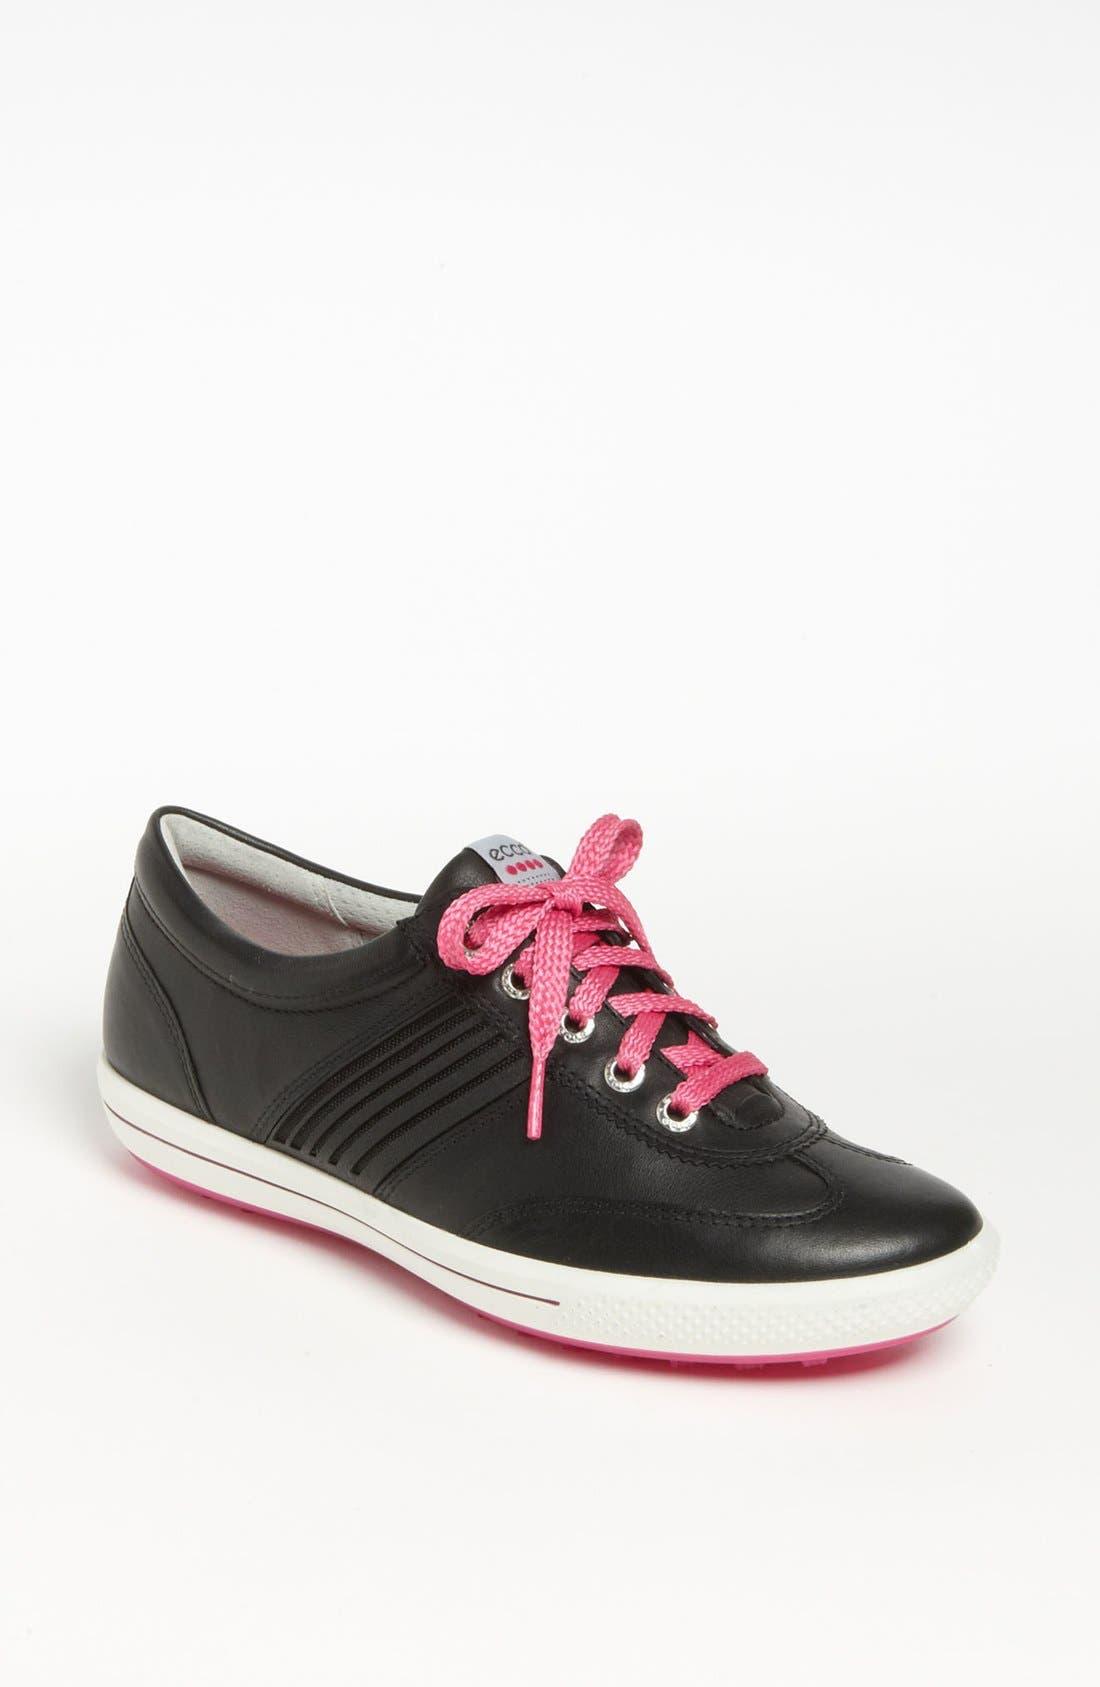 Alternate Image 1 Selected - ECCO 'Golf Street' Sport Sneaker (Women)